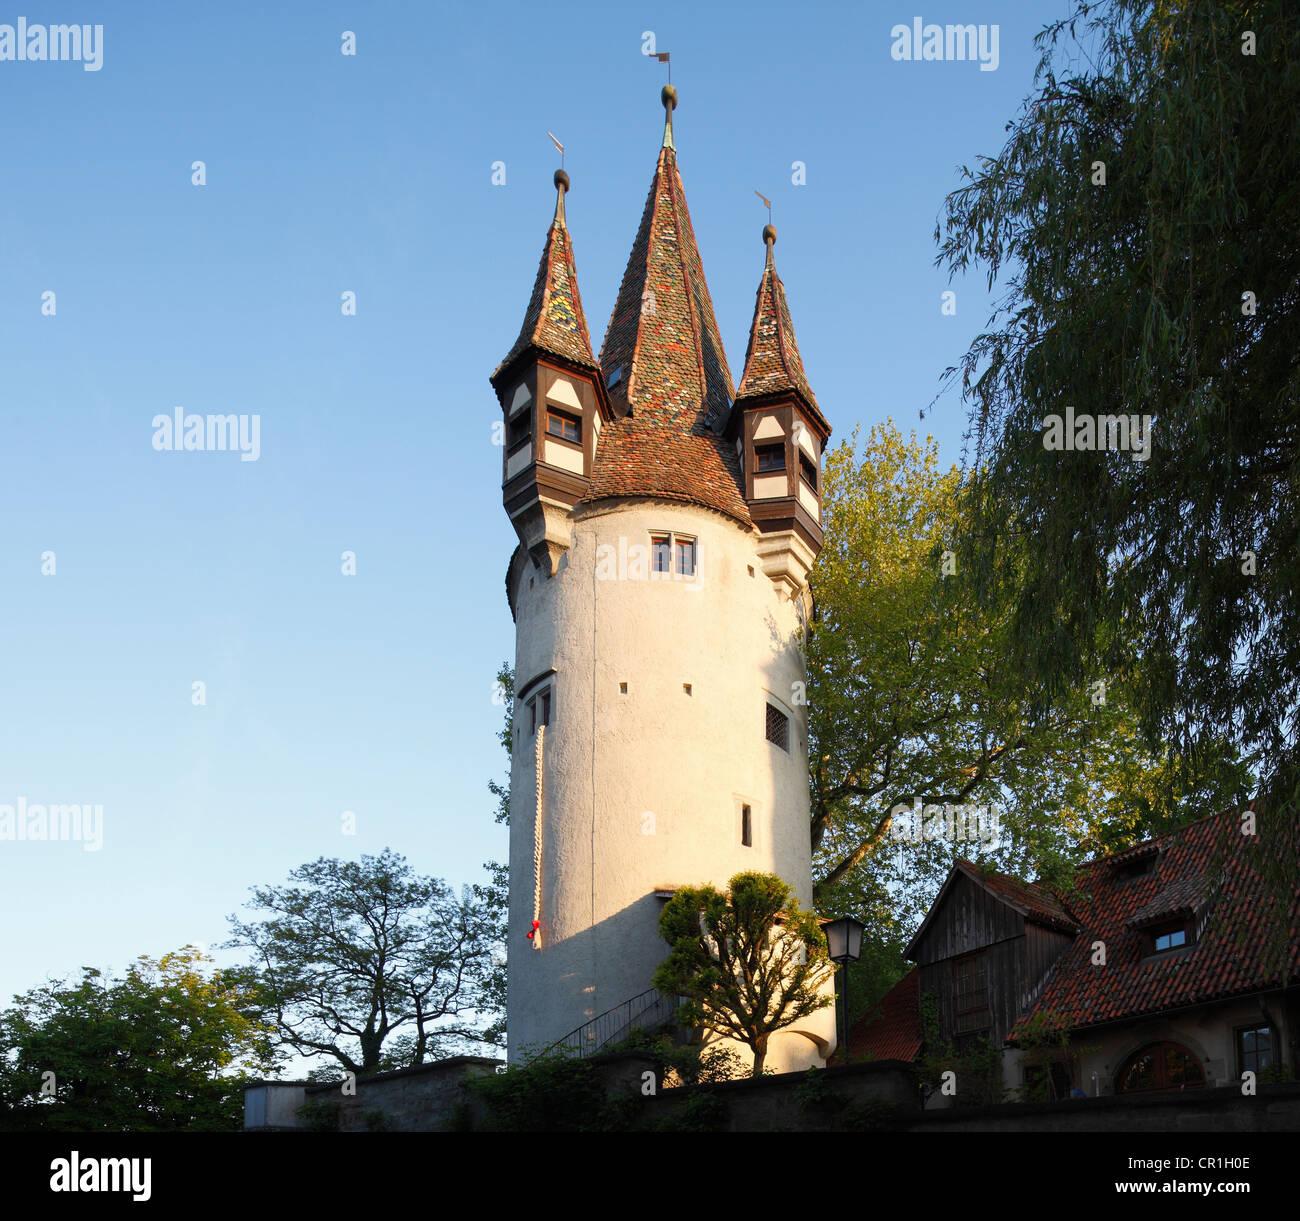 Diebsturm tower, Lindau on Lake Constance, Swabia, Bavaria, Germany, Europe, PublicGround Stock Photo